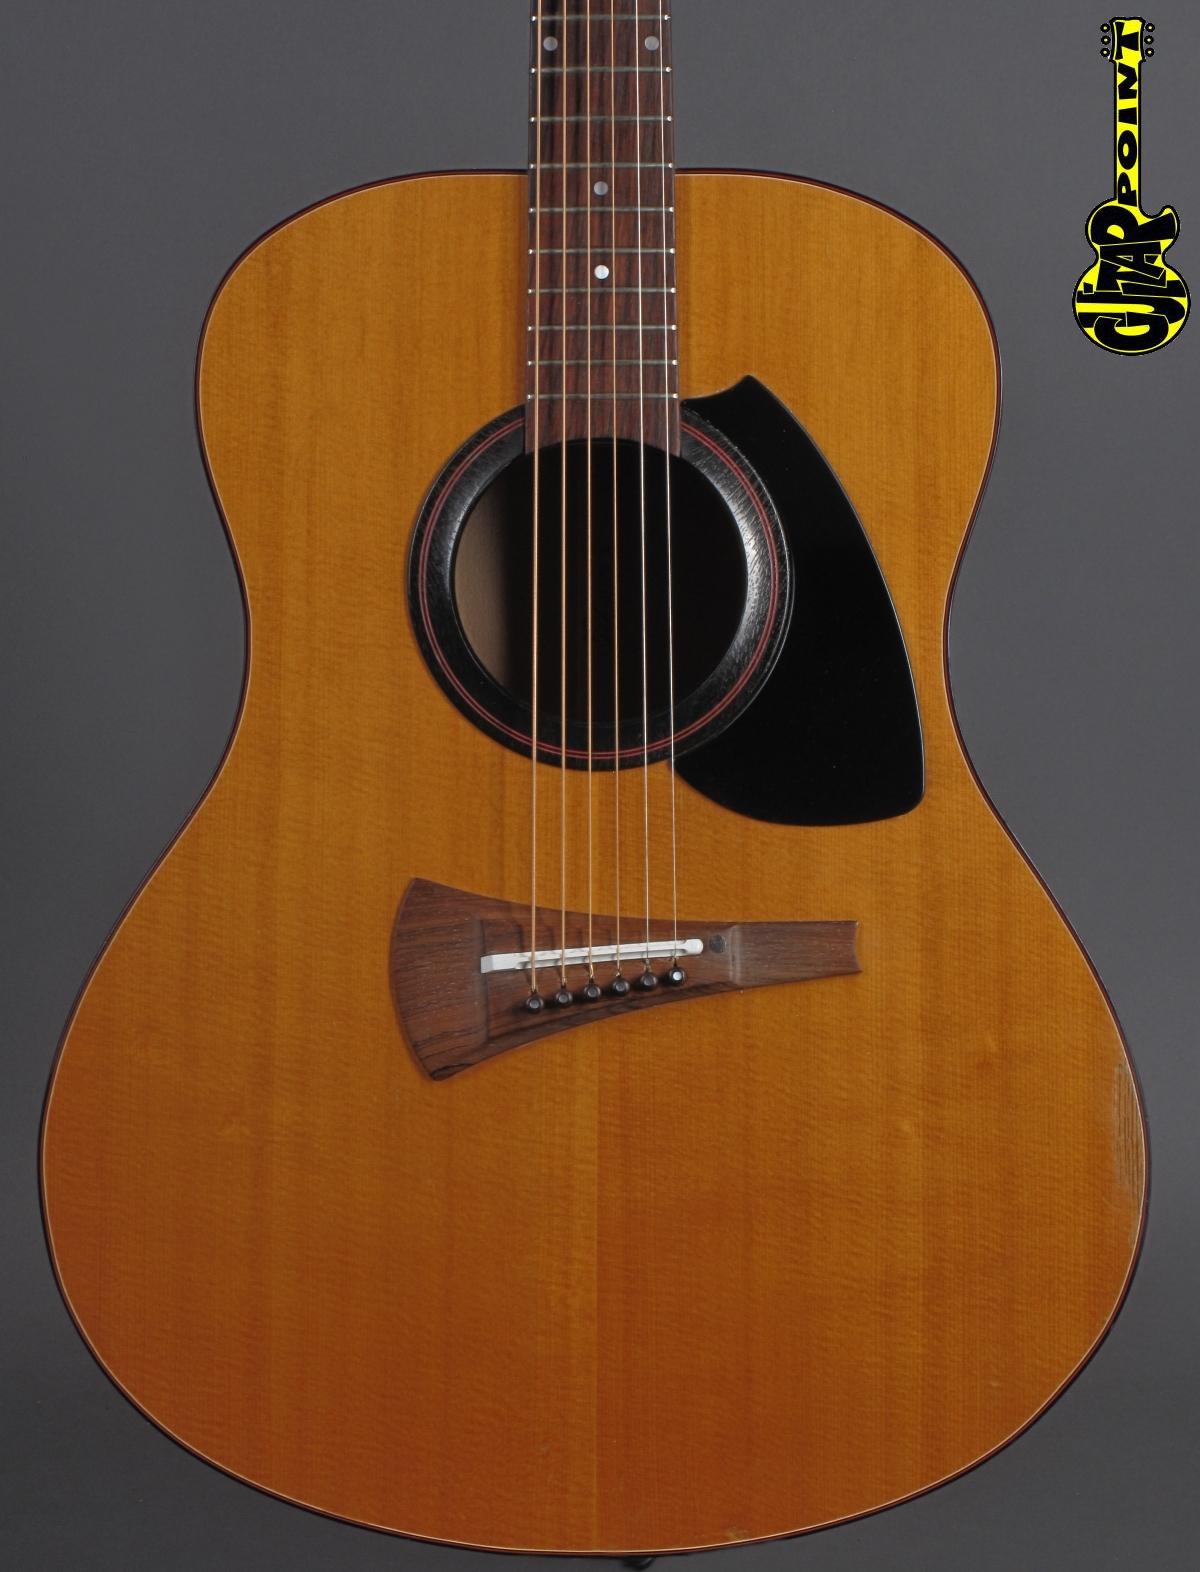 1975 Gibson MK-53 - Natural